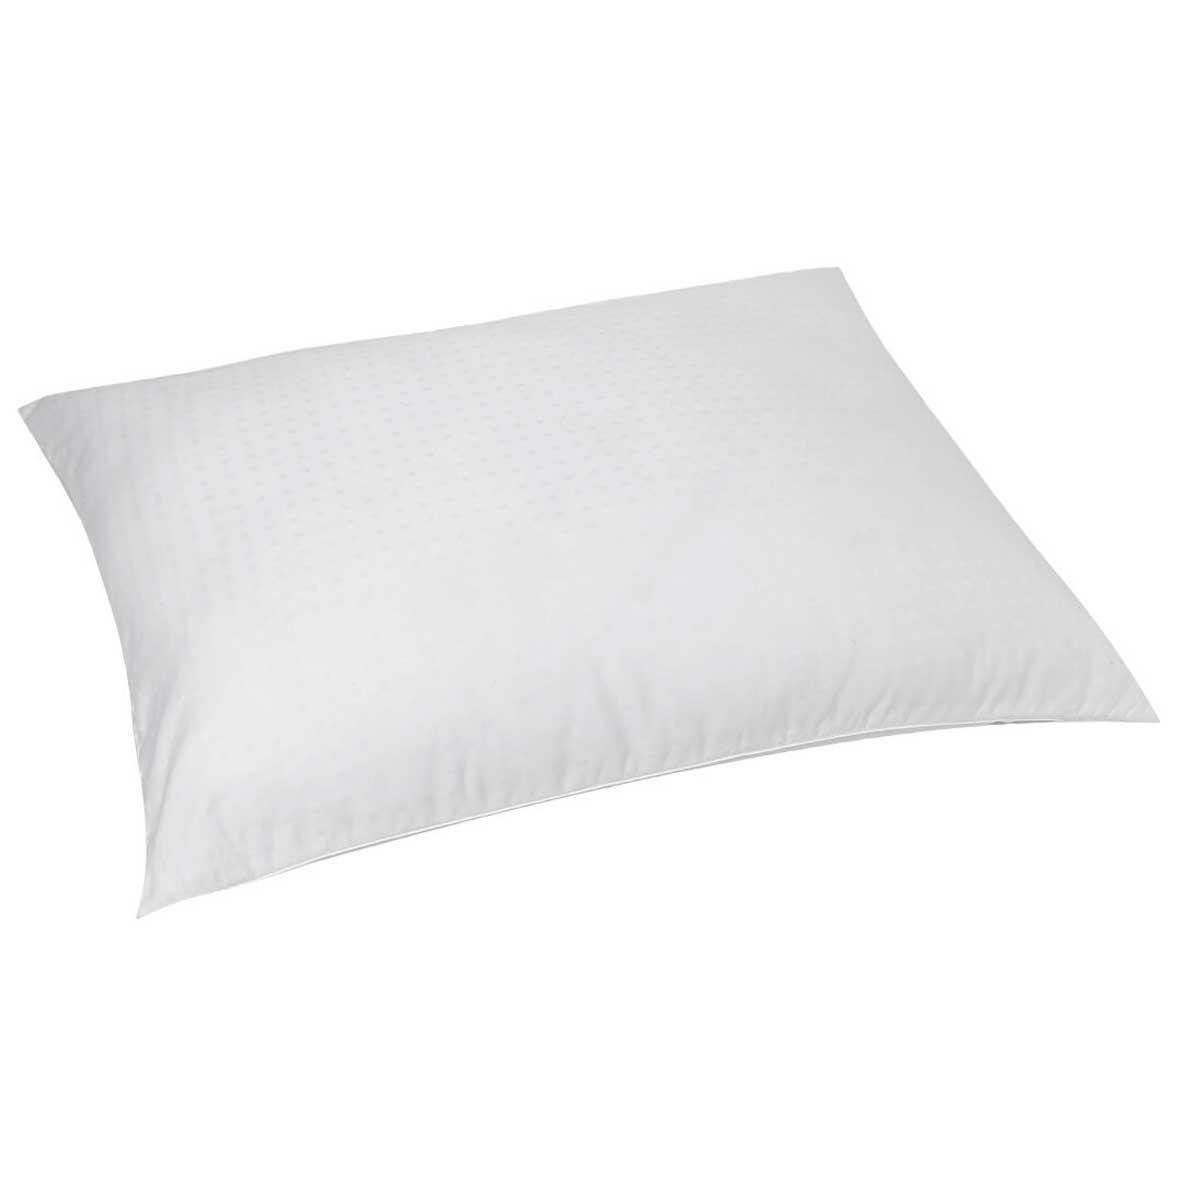 Travesseiro Pluma Alternativa Fibra Siliconada 50 x 70 Santista